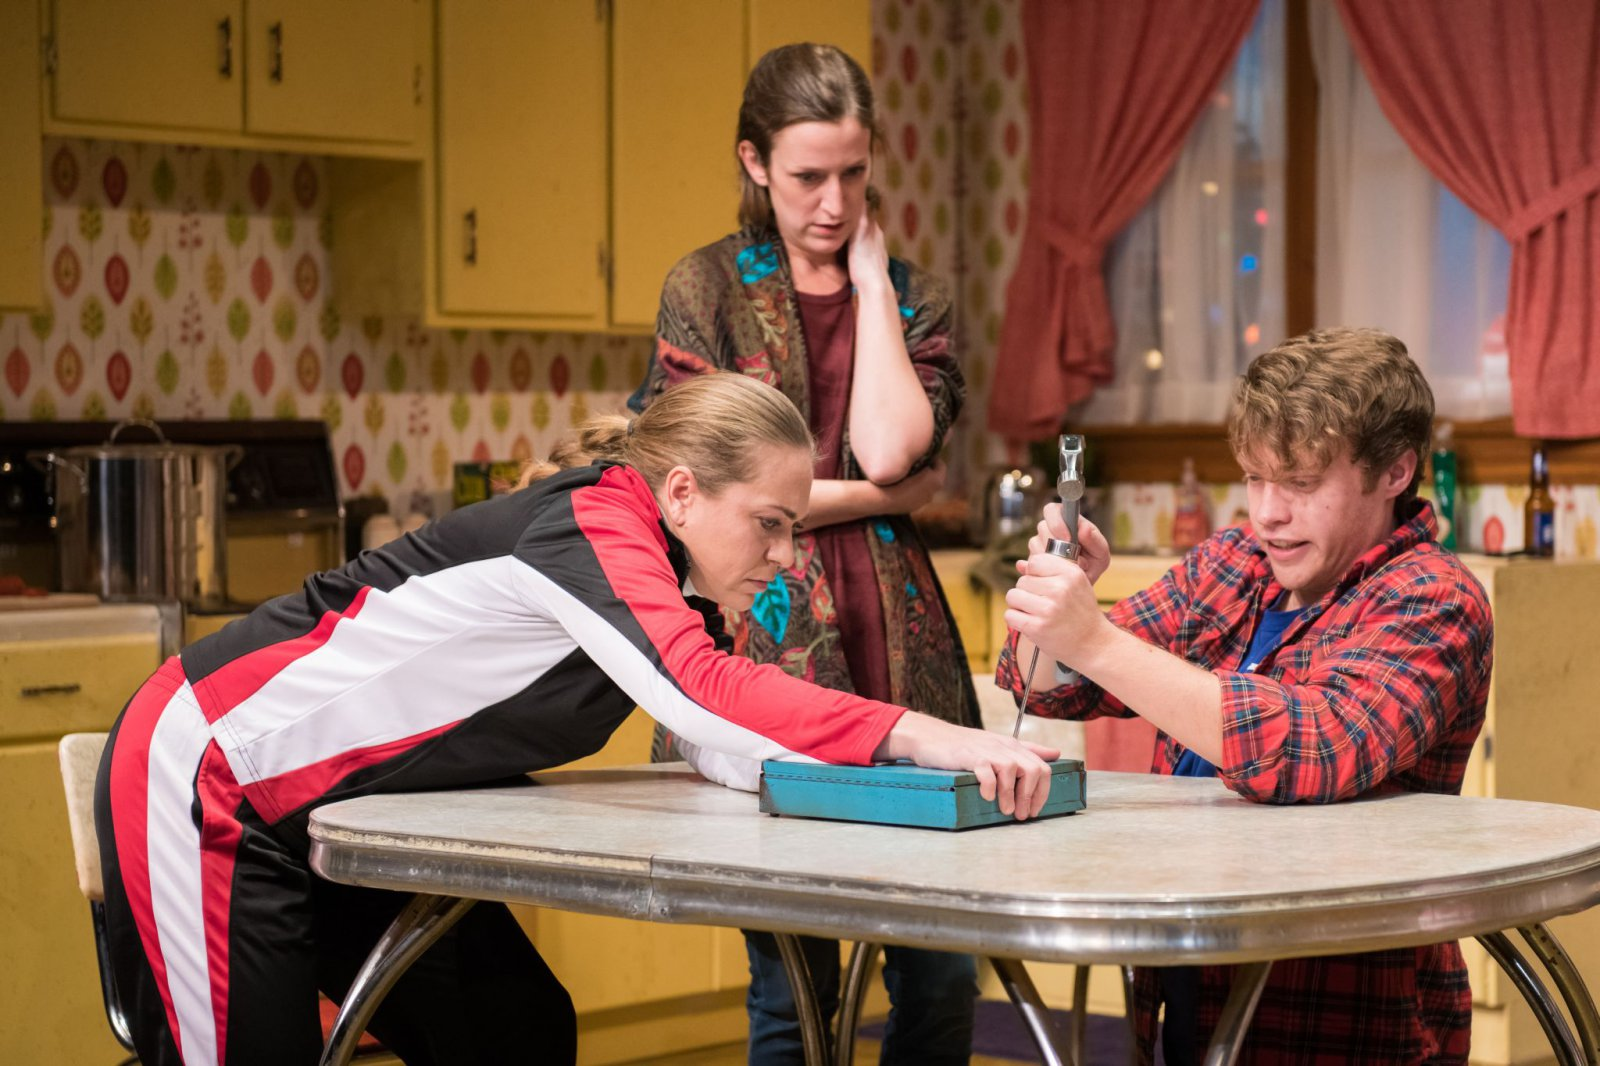 L-R: Greta Wohlrabe as Beverly Nowak, Kat Wodtke as Ruth Nowak, Josh Krause as Jimmy Nowak.